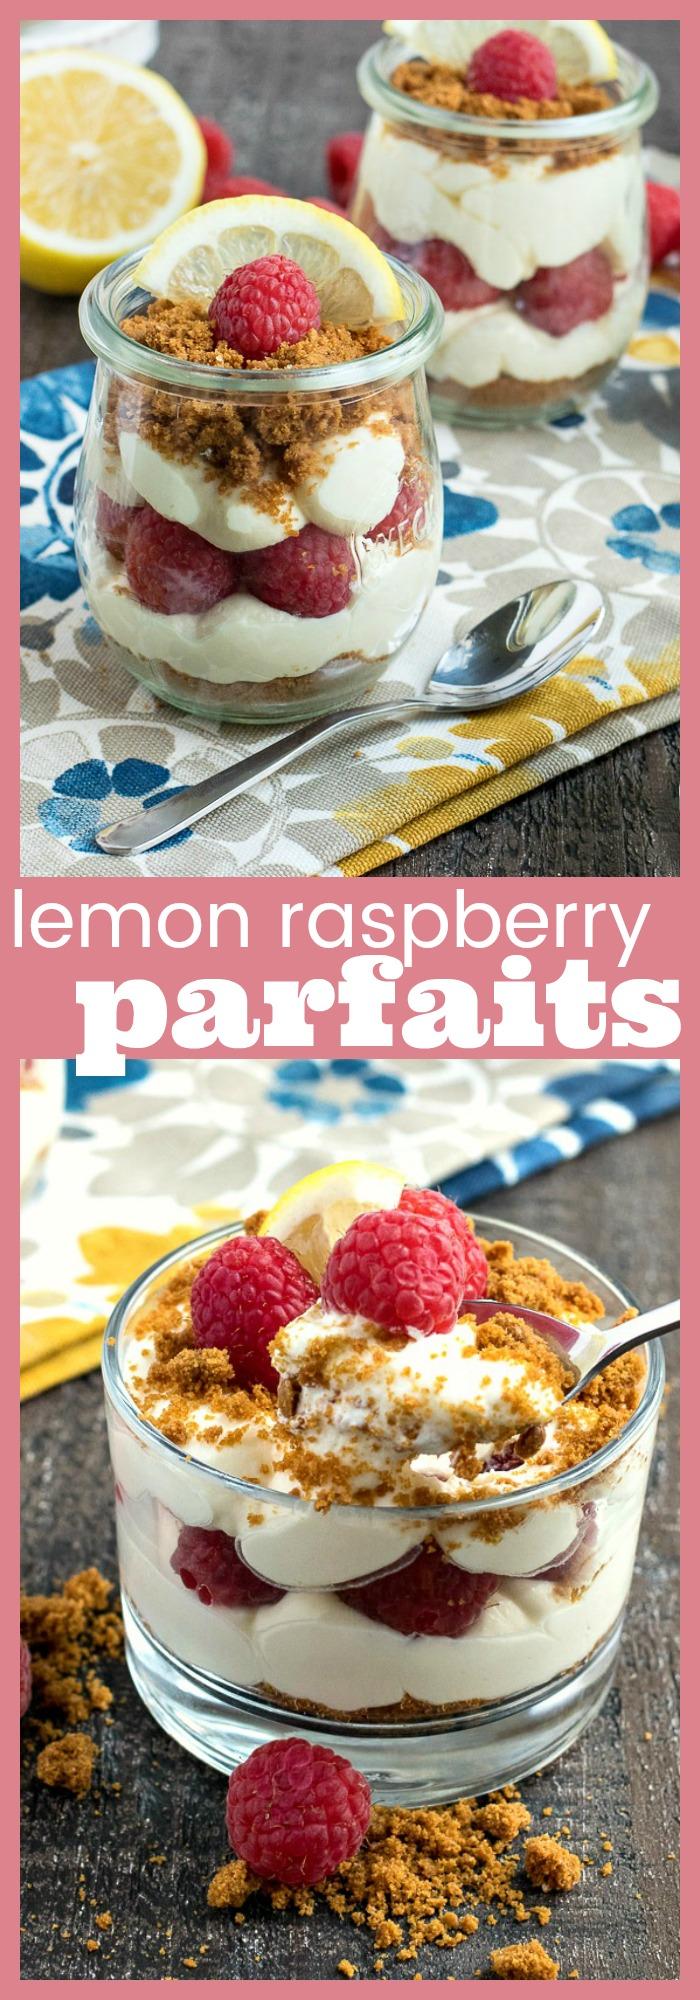 Lemon Raspberry Parfaits photo collage